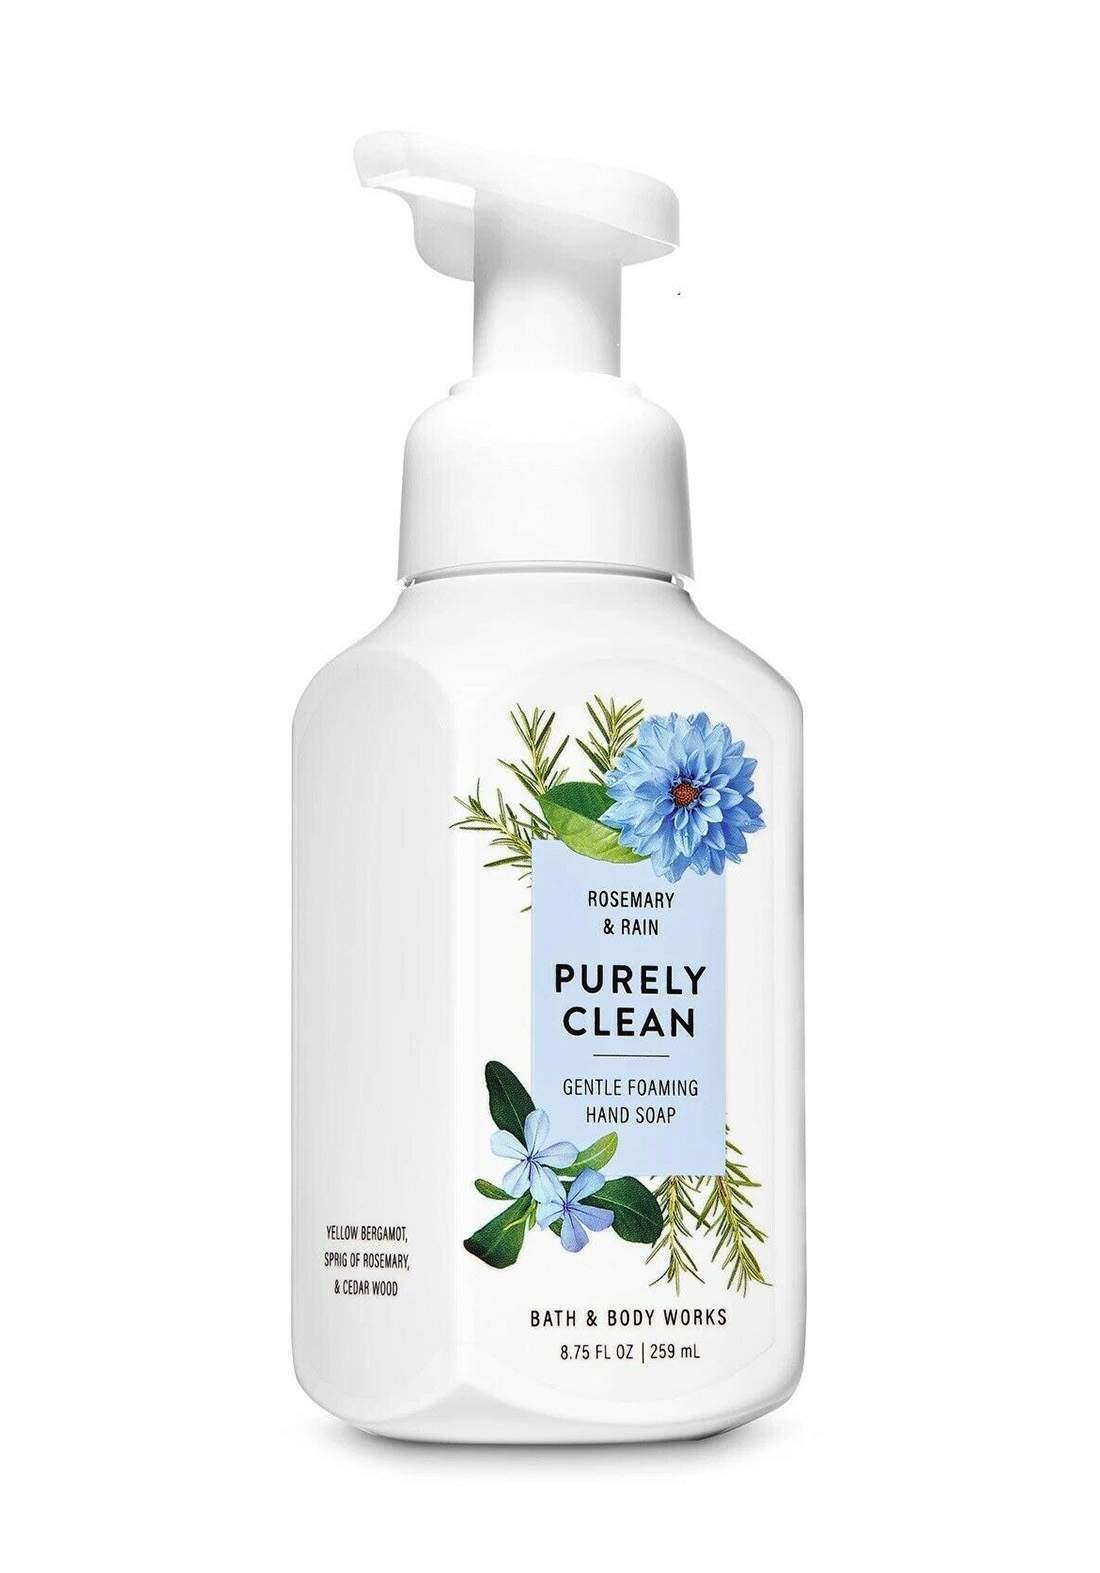 Bath & Body Works White Barn Purely Clean Rosemary and Rain Gentle Foaming Hand Soap 259ml صابون رغوة لليدين